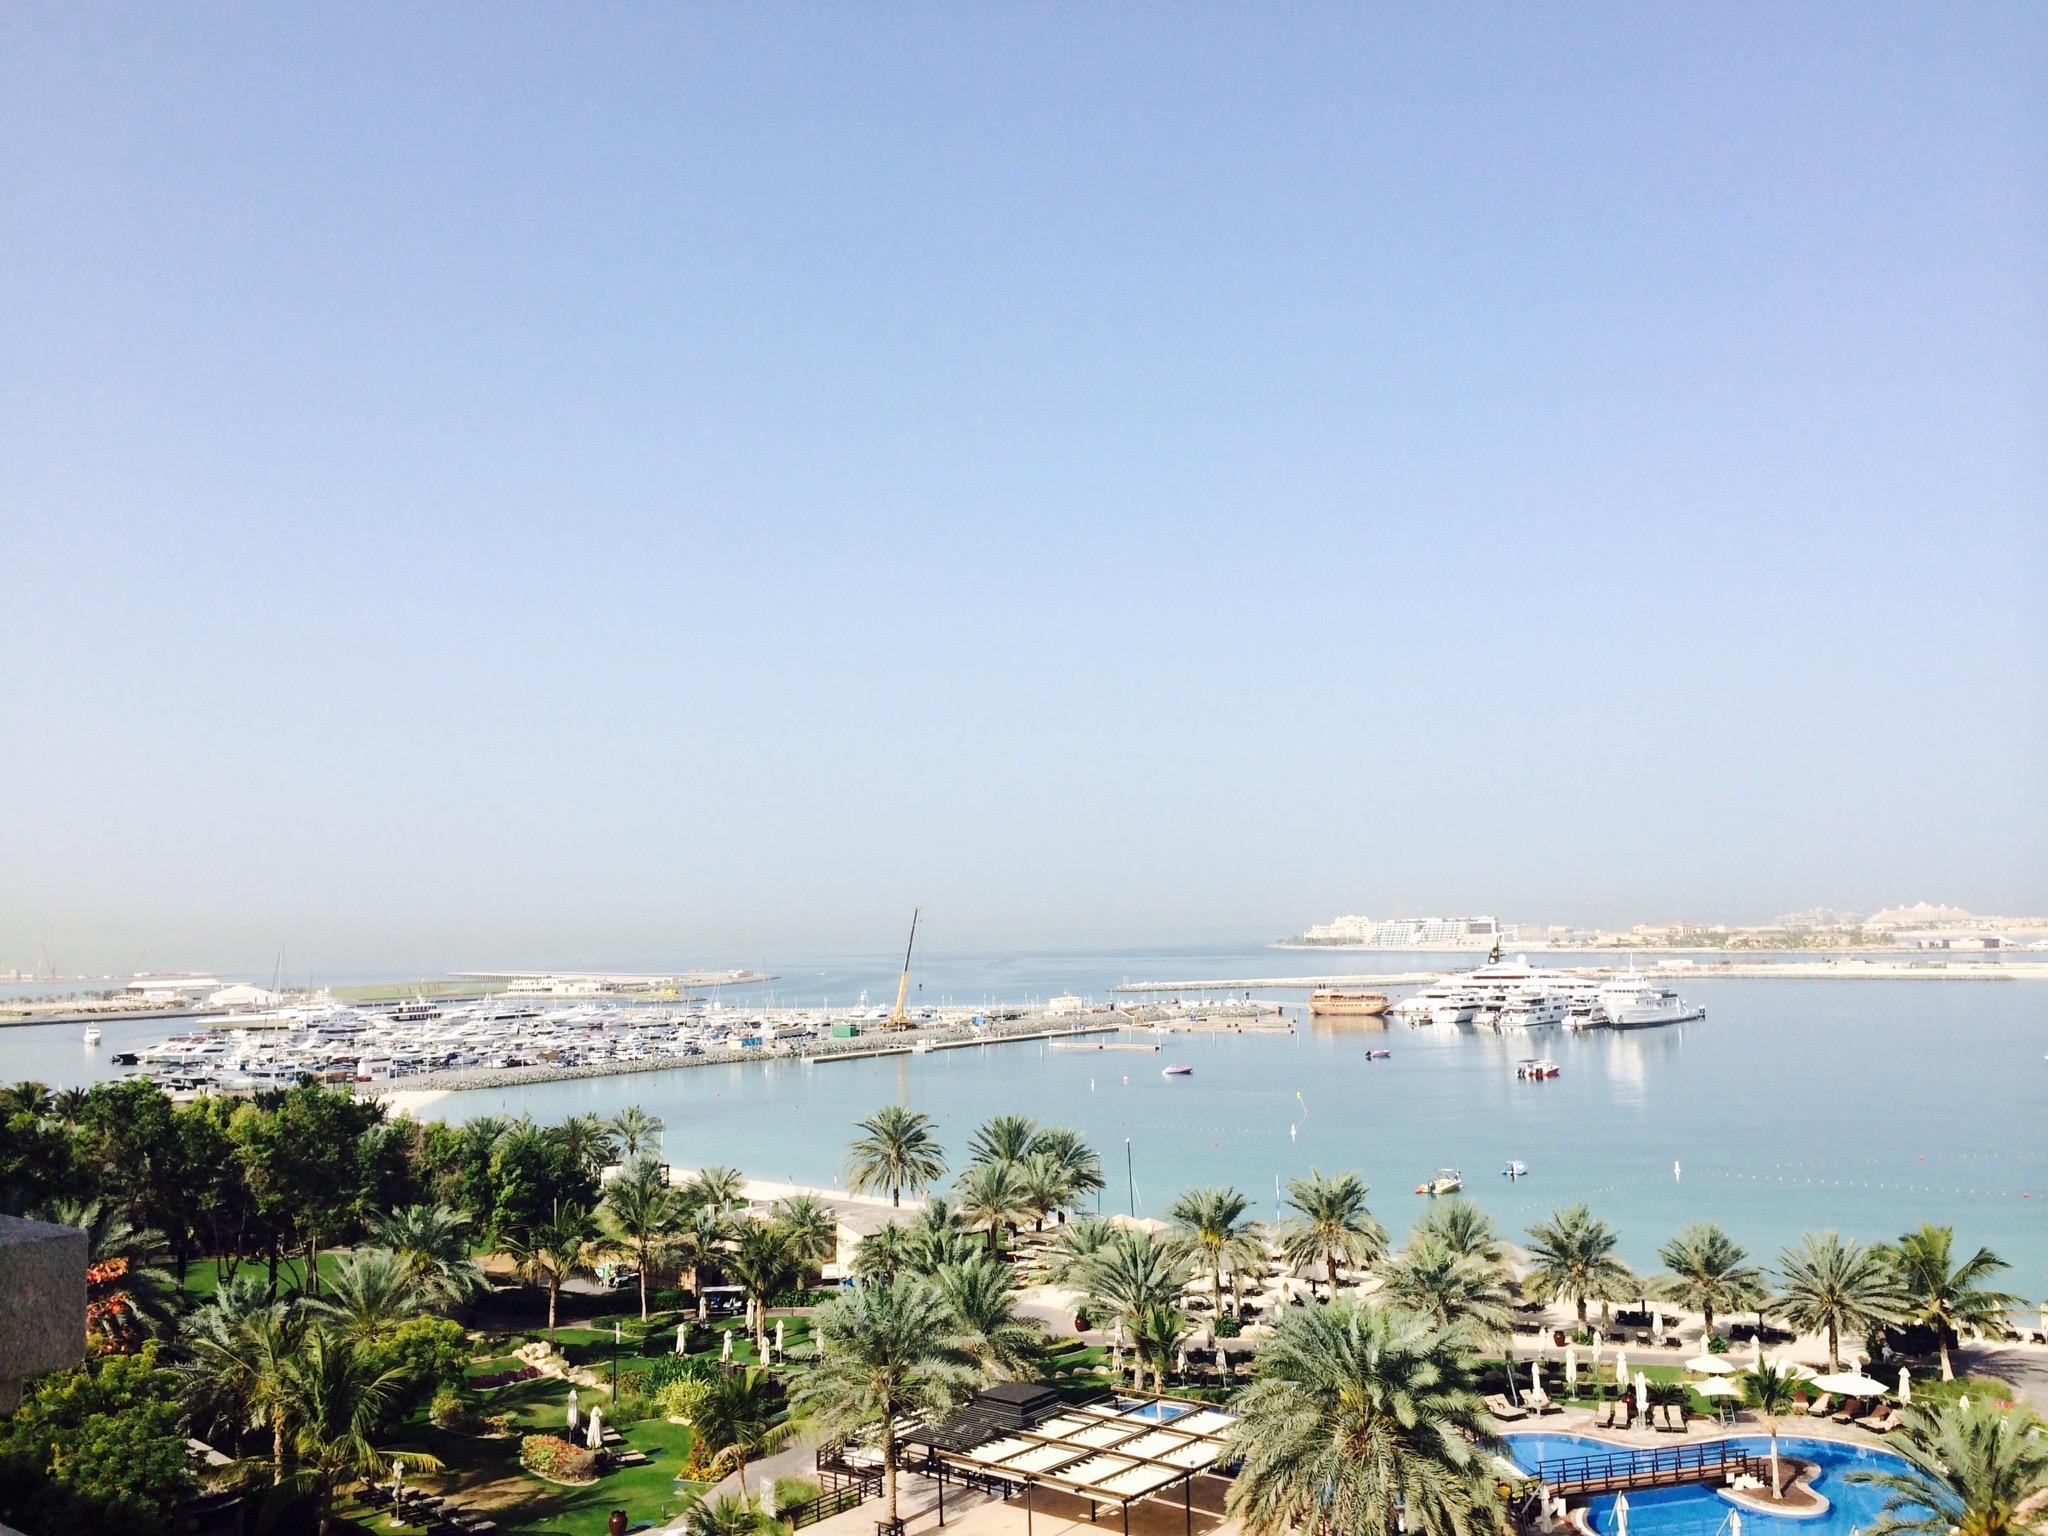 Beautiful View of Dubai Waterfront